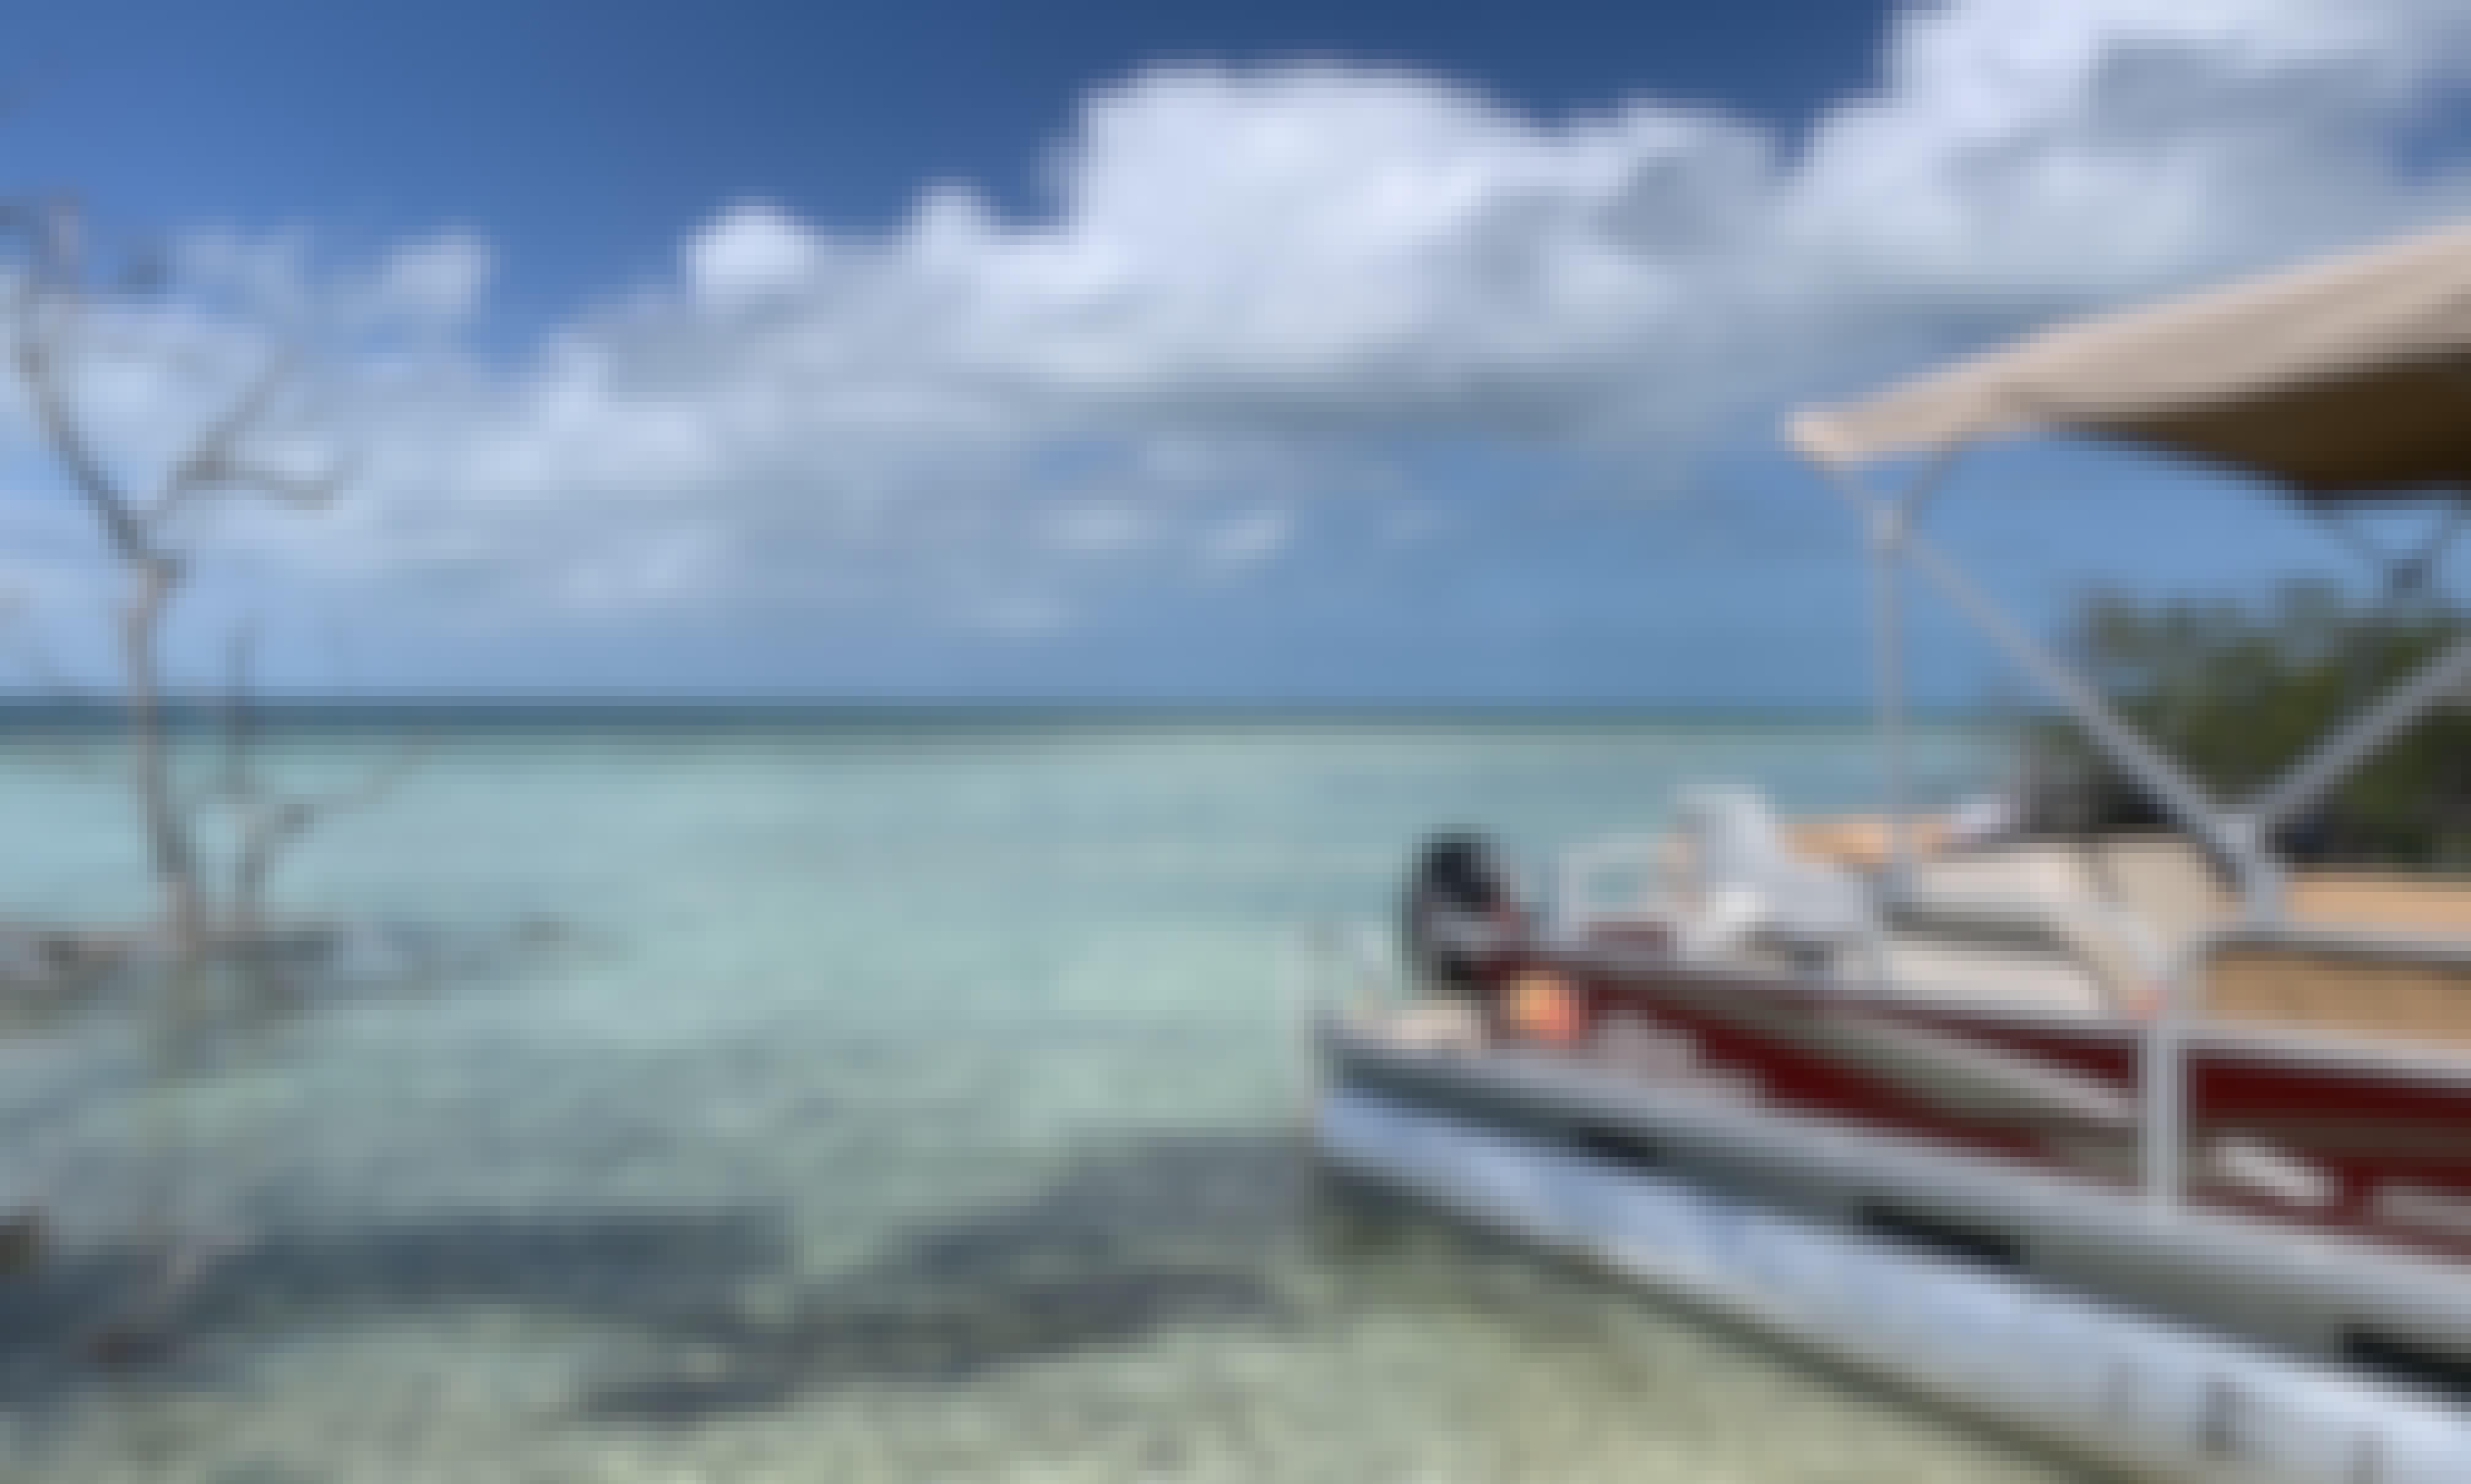 18' Party Barge Pontoon for Rent in Cudjoe Key, Florida!!!